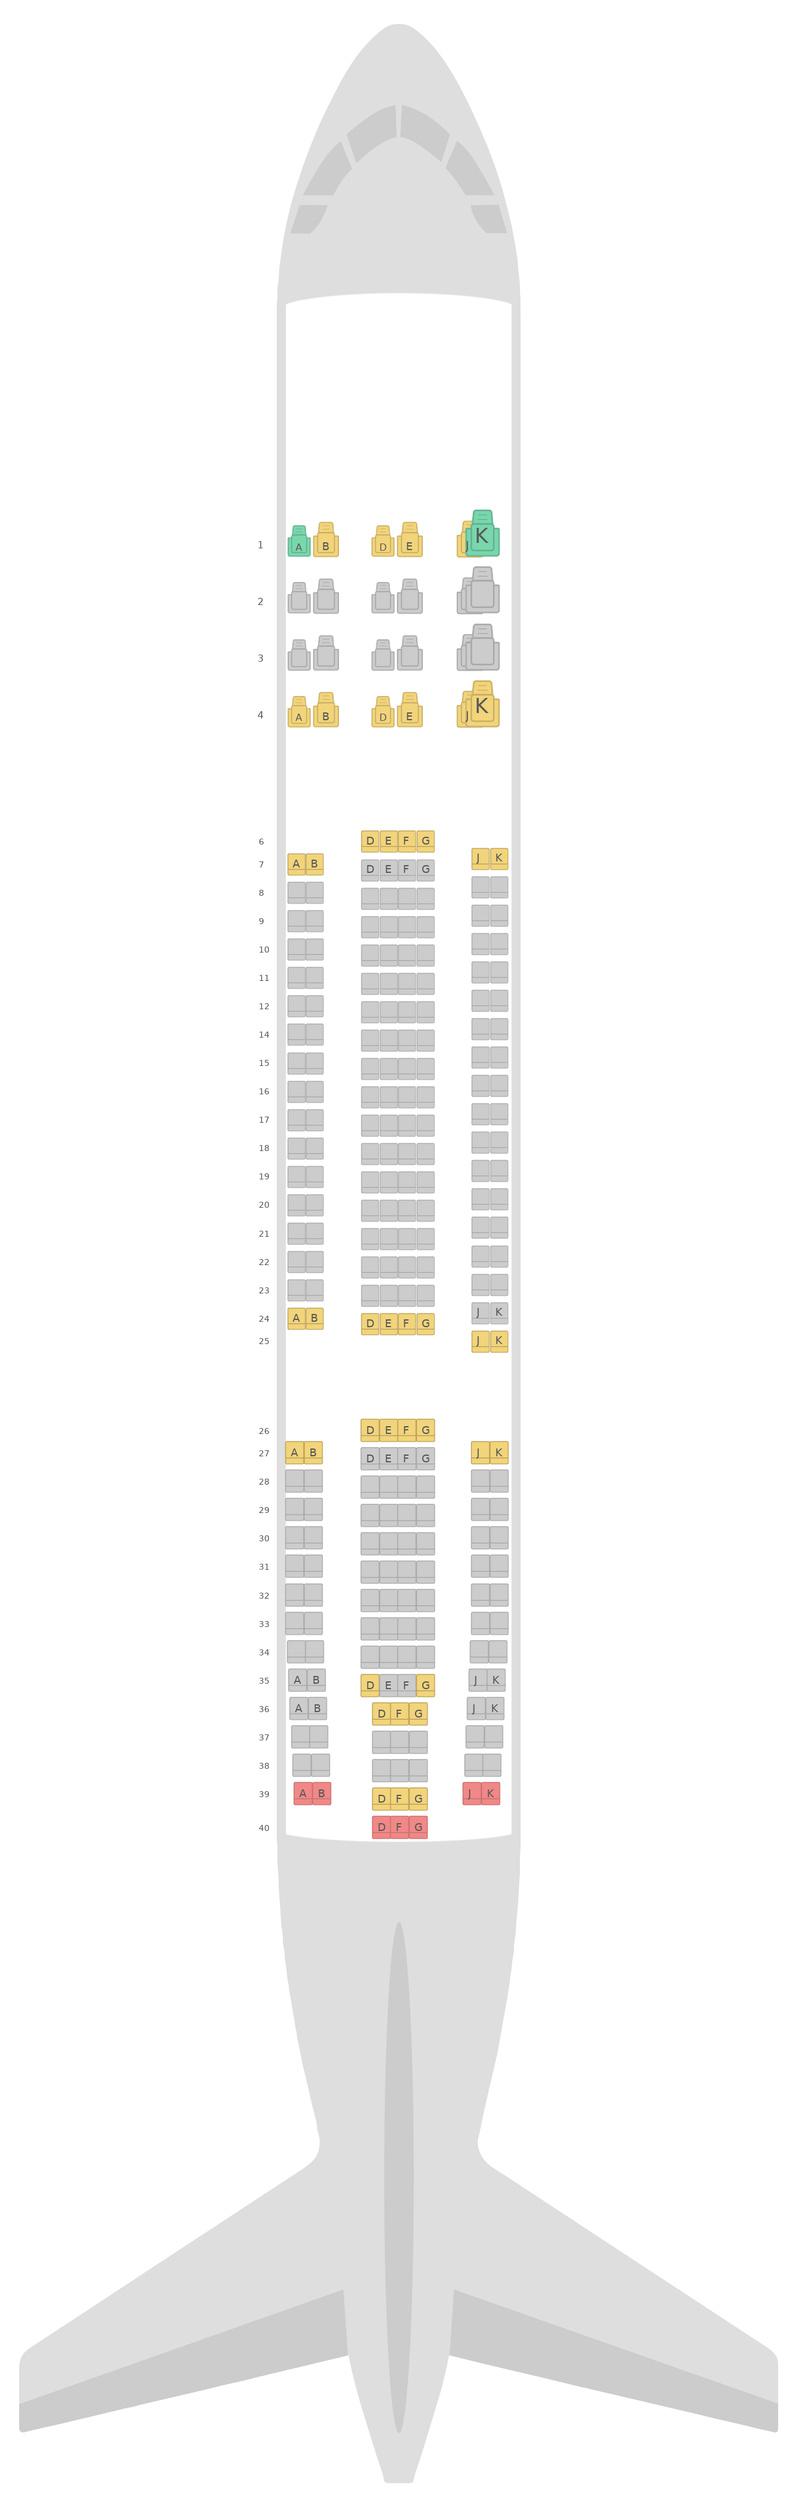 Sitzplan Airbus A330-200 (332) Fiji Airways